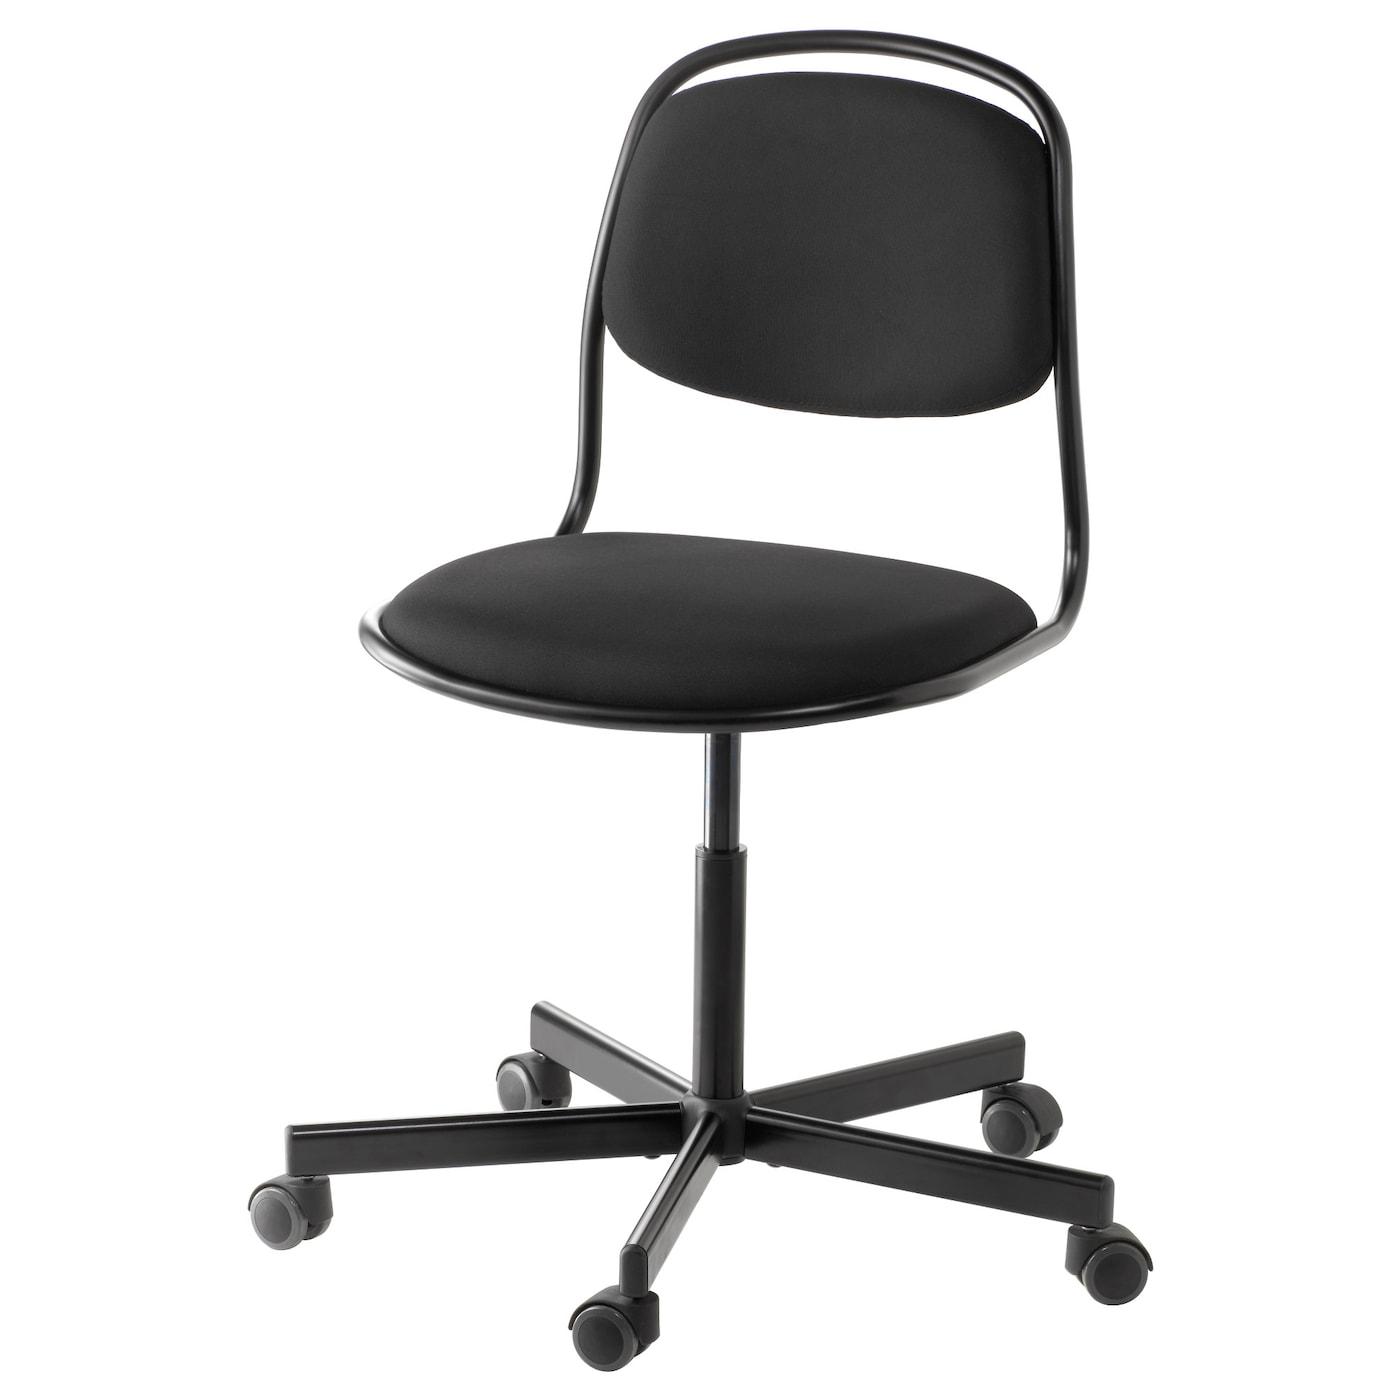 Black Swivel Chair 214 Rfj 196 Ll Sporren Swivel Chair Black Ikea